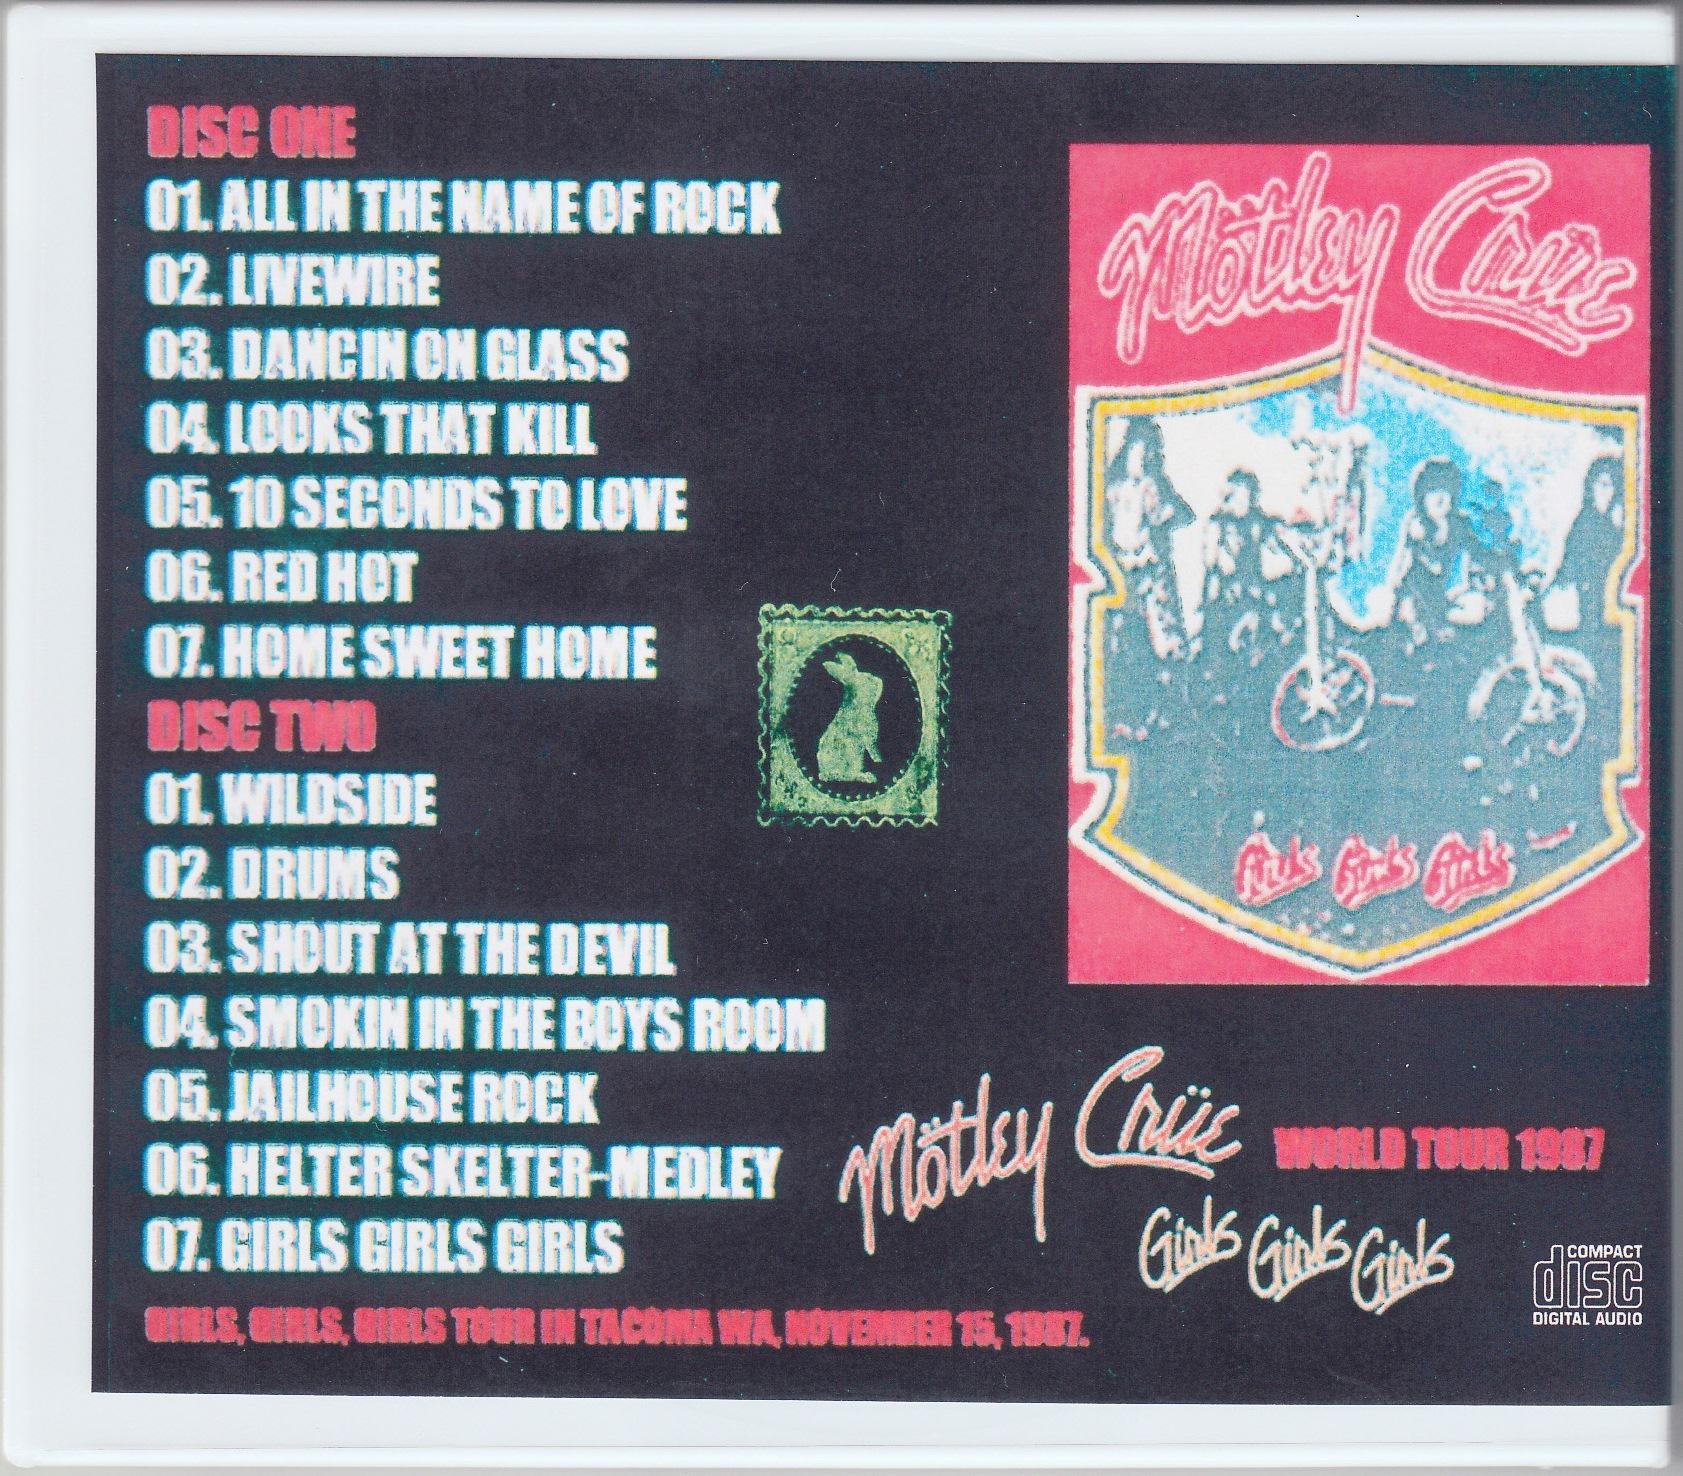 World Of Bootlegs